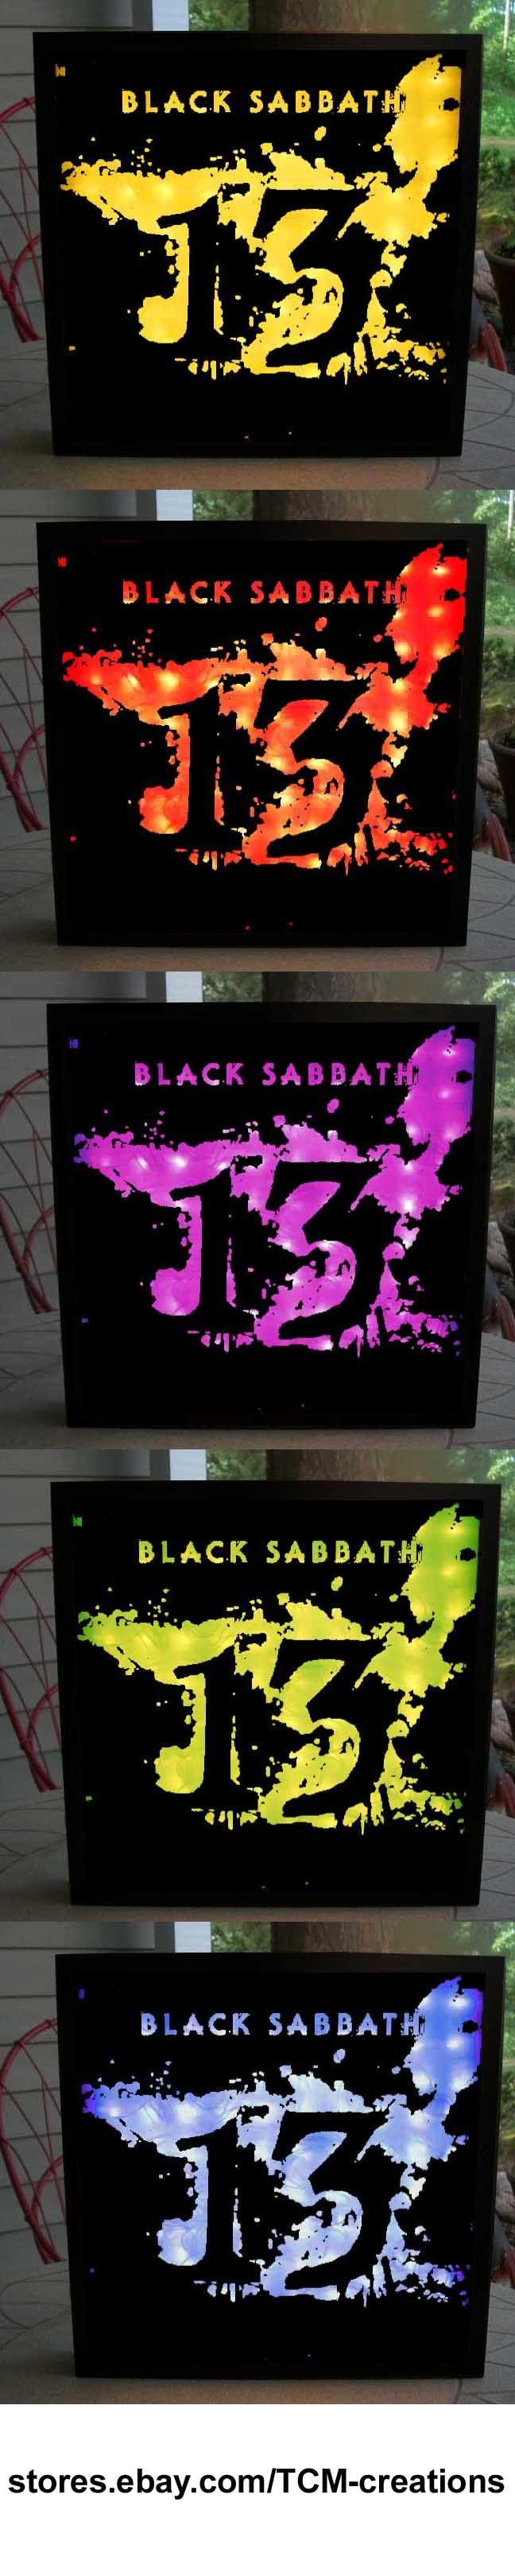 Back Sabbath Shadow Boxes with LED lighting. Ozzy Osbourne, Tony Iommi, Geezer Butler, Bill Ward, Ronnie James Dio, Paranoid, Master Of Reality, Vol. 4, Sabbath Bloody Sabbath, Sabotage, Technical Ecstasy, Never Say Die!, Heaven and Hell, Mob Rules, Born Again, Seventh Star, The Eternal Idol, Headless Cross, Tyr, Dehumanizer, Cross Purposes, Forbidden, 13.